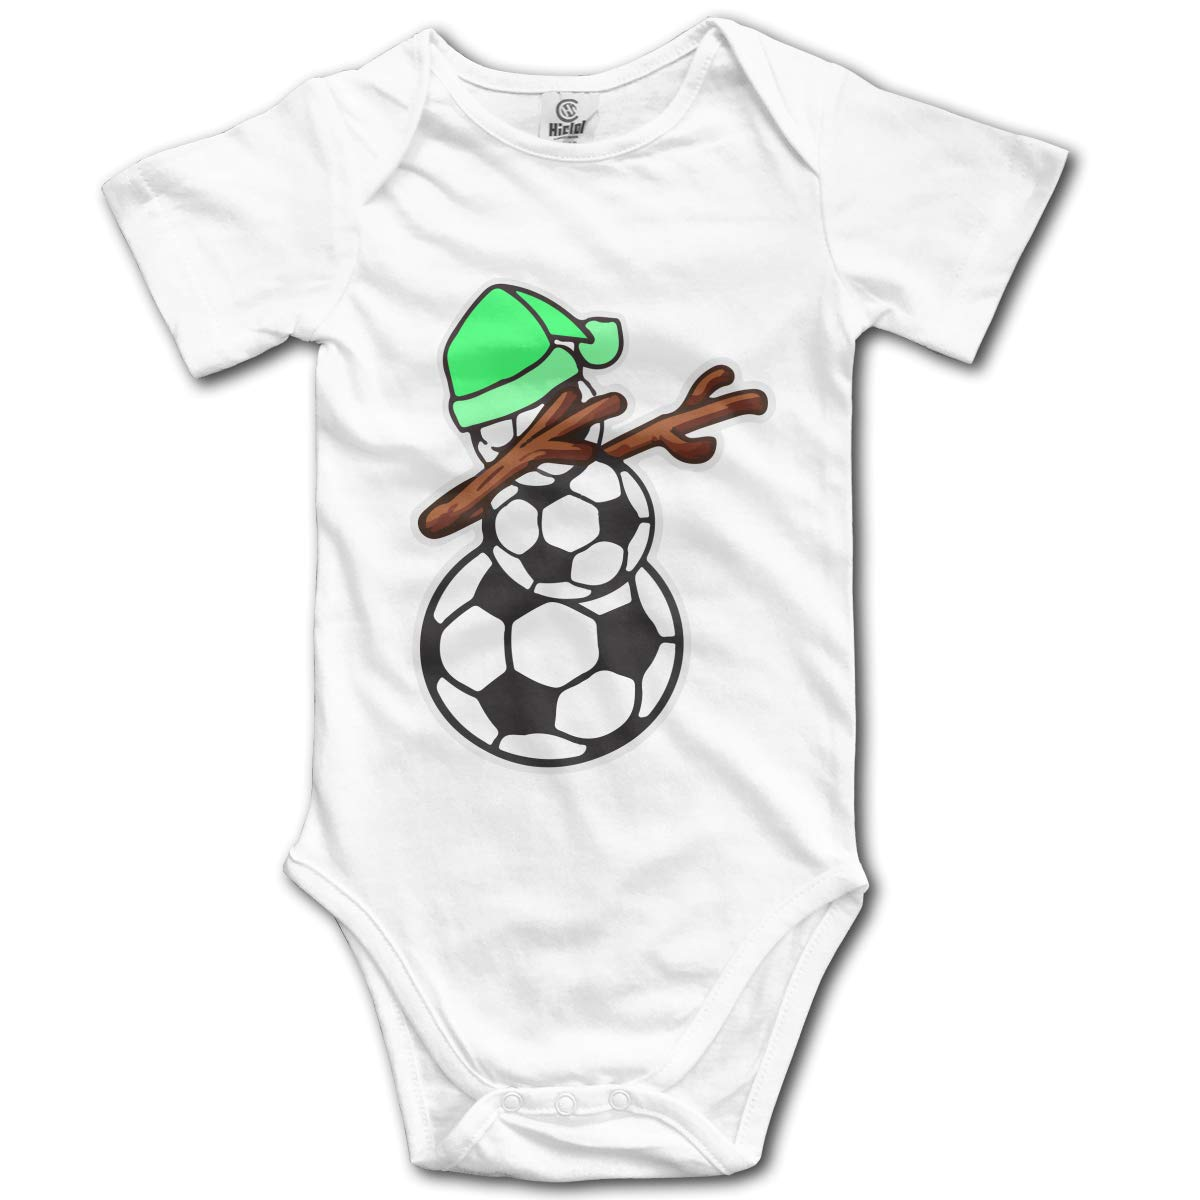 Dabbing Soccer Snowman Newborn Infant Baby 100/% Organic Cotton Romper Jumpsuit 0-24 Months